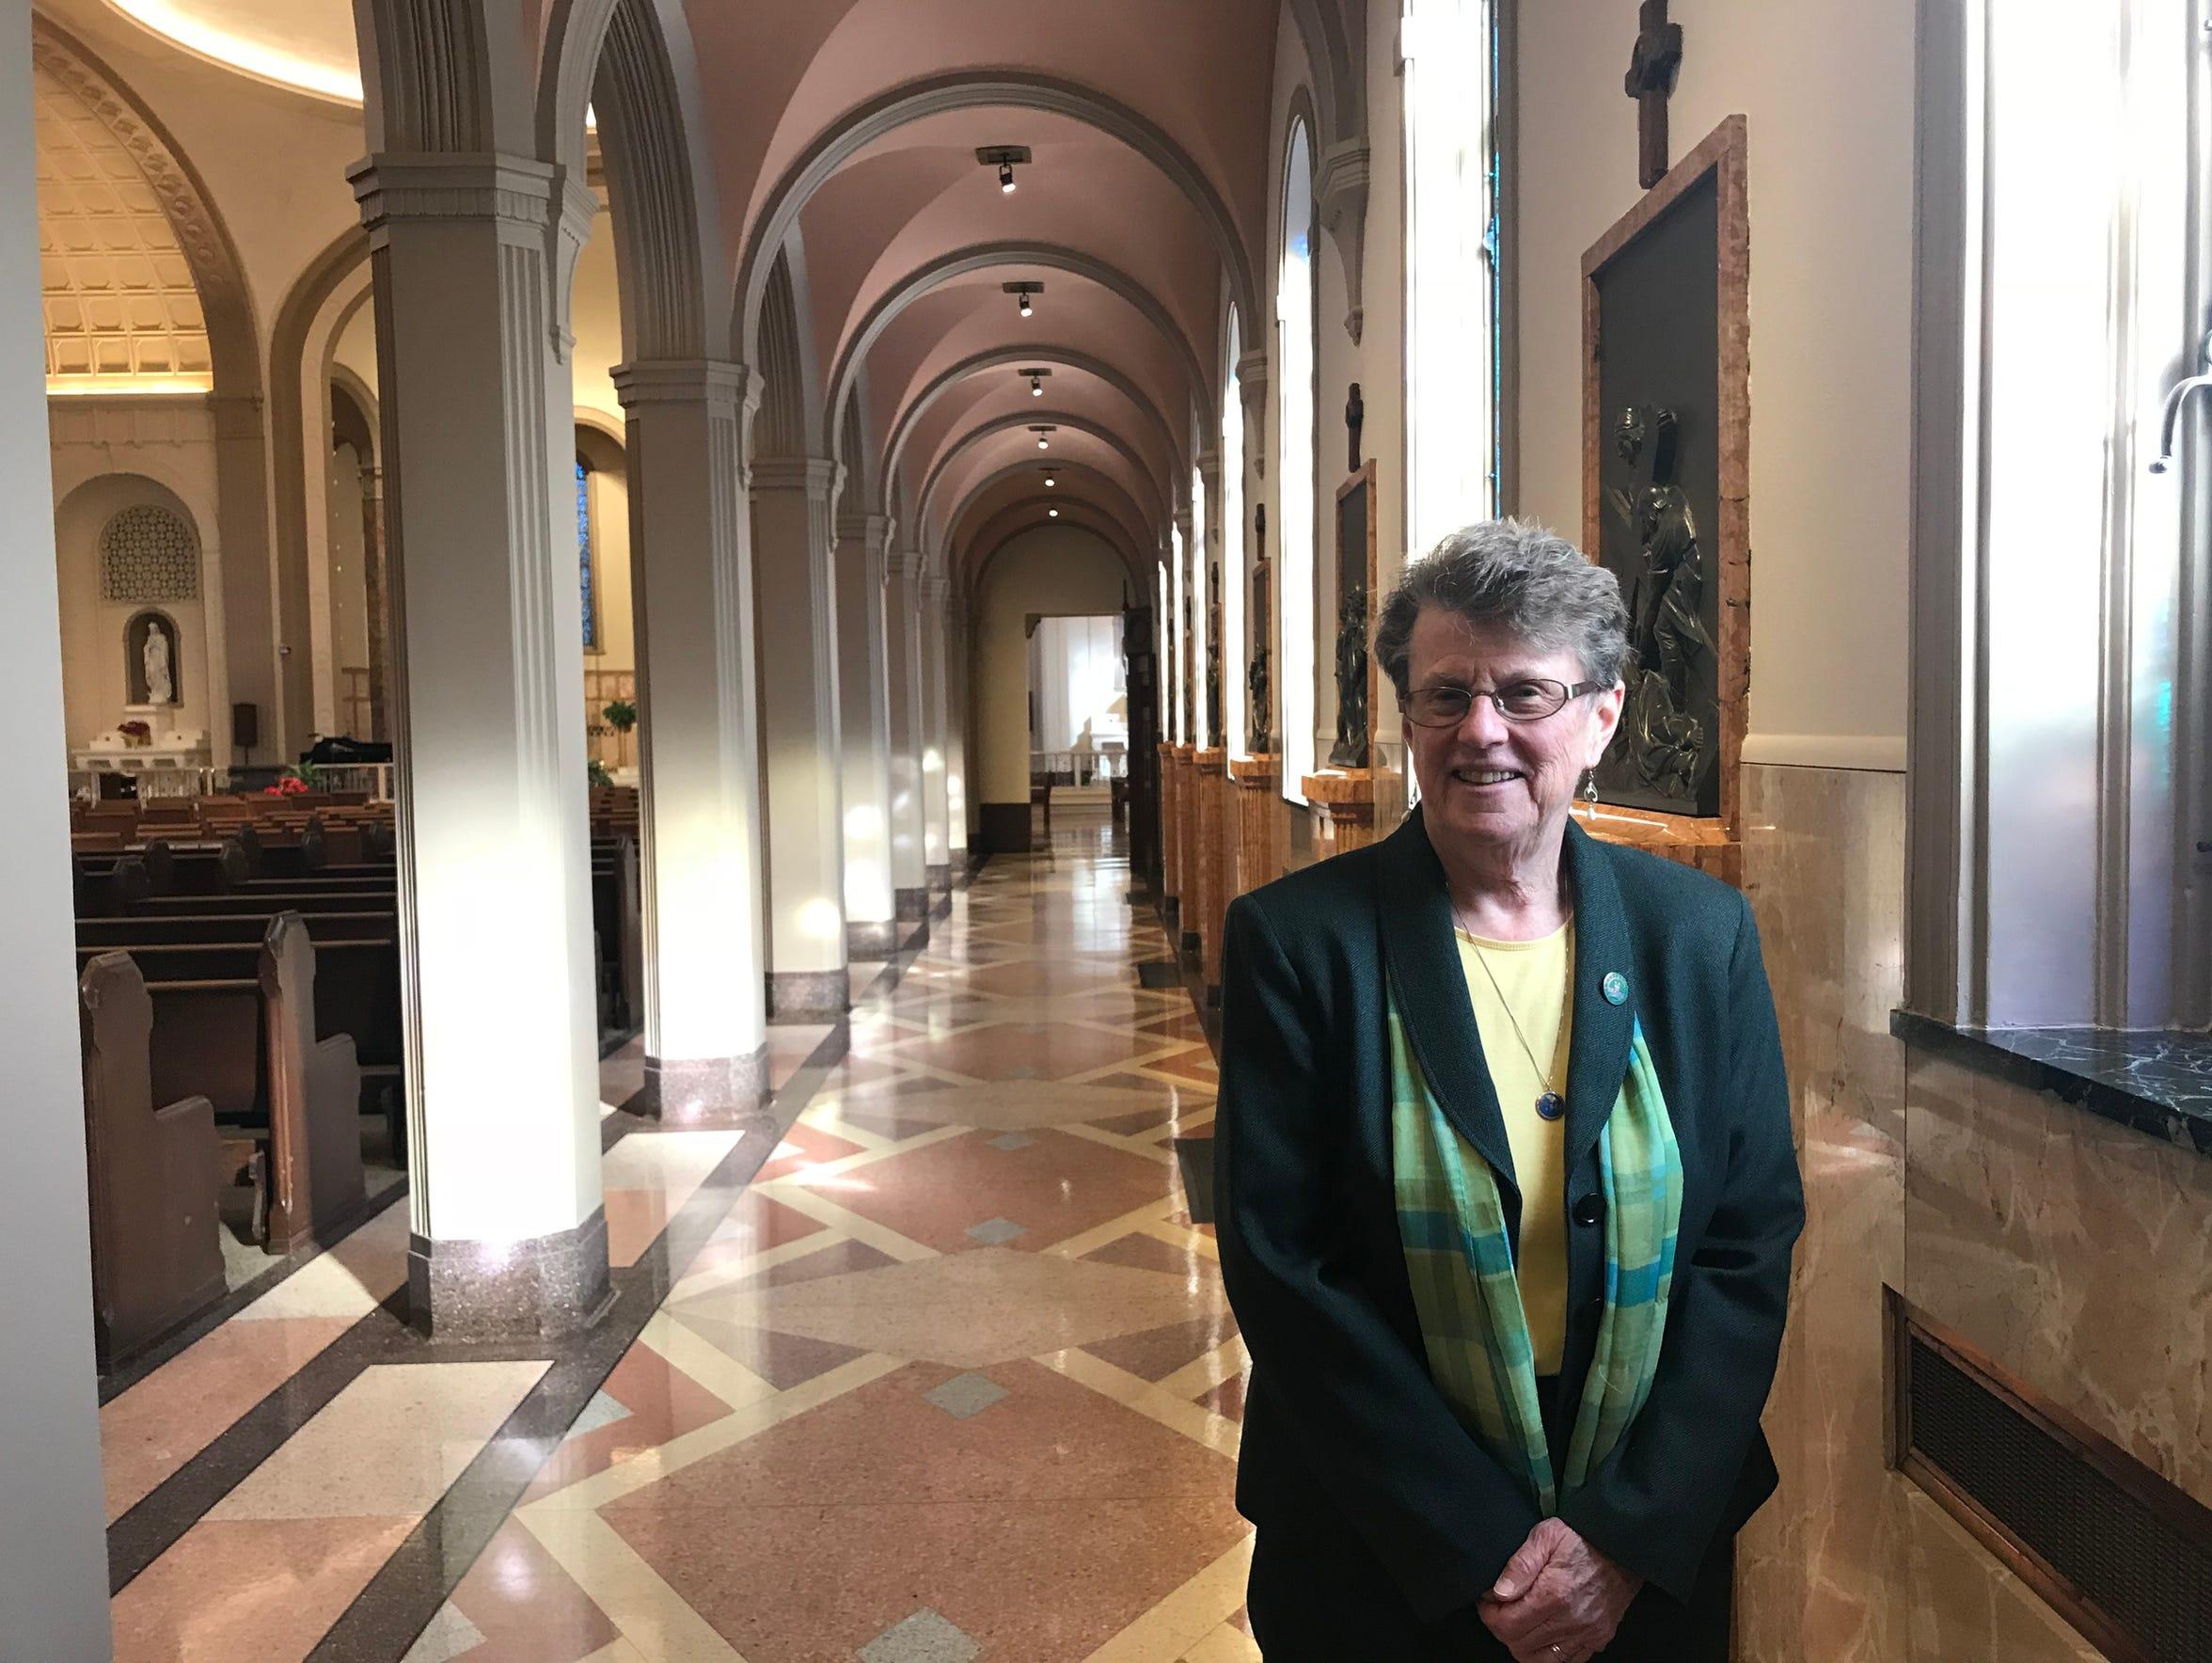 Sr. Mary Jane Herb, president of the religious order